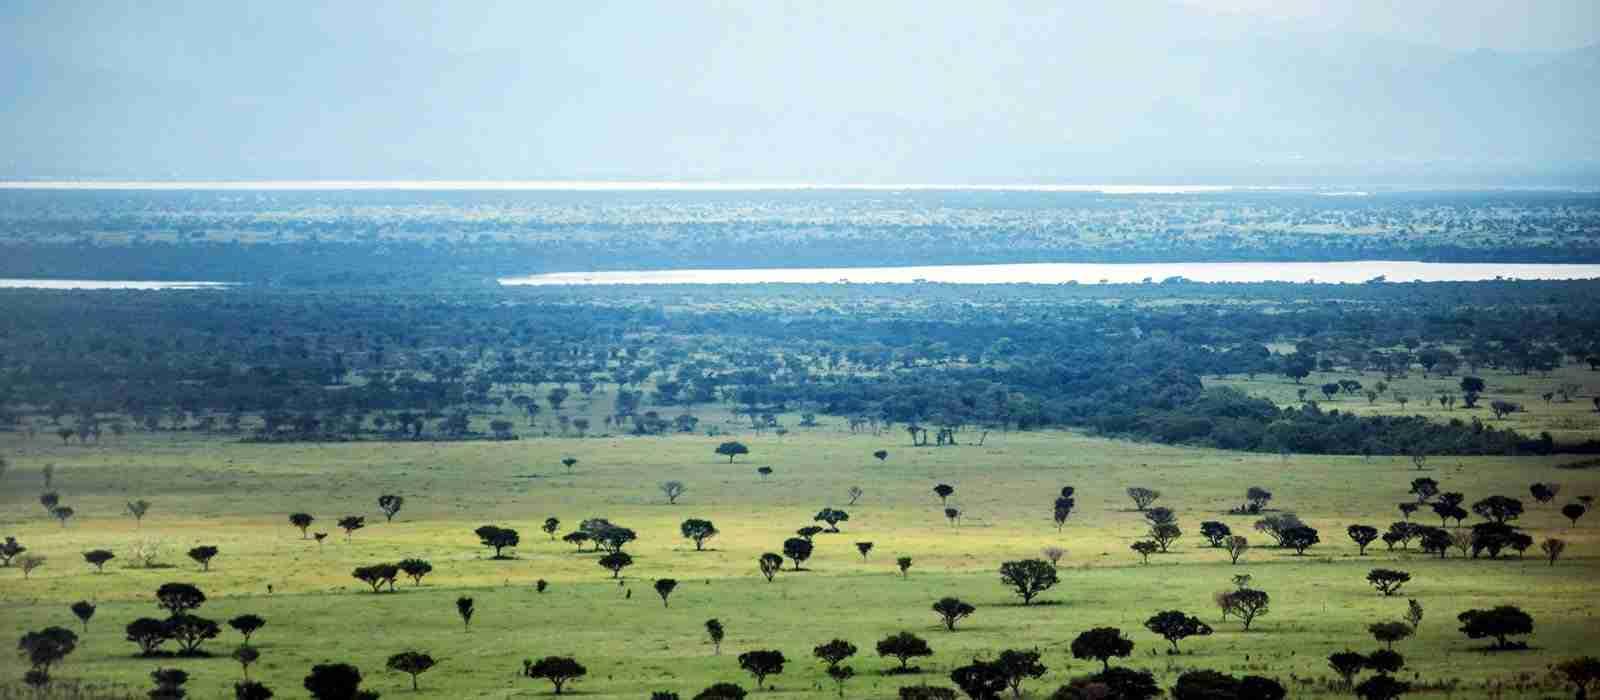 The Kasenyi Plains and Kalinzu Channel